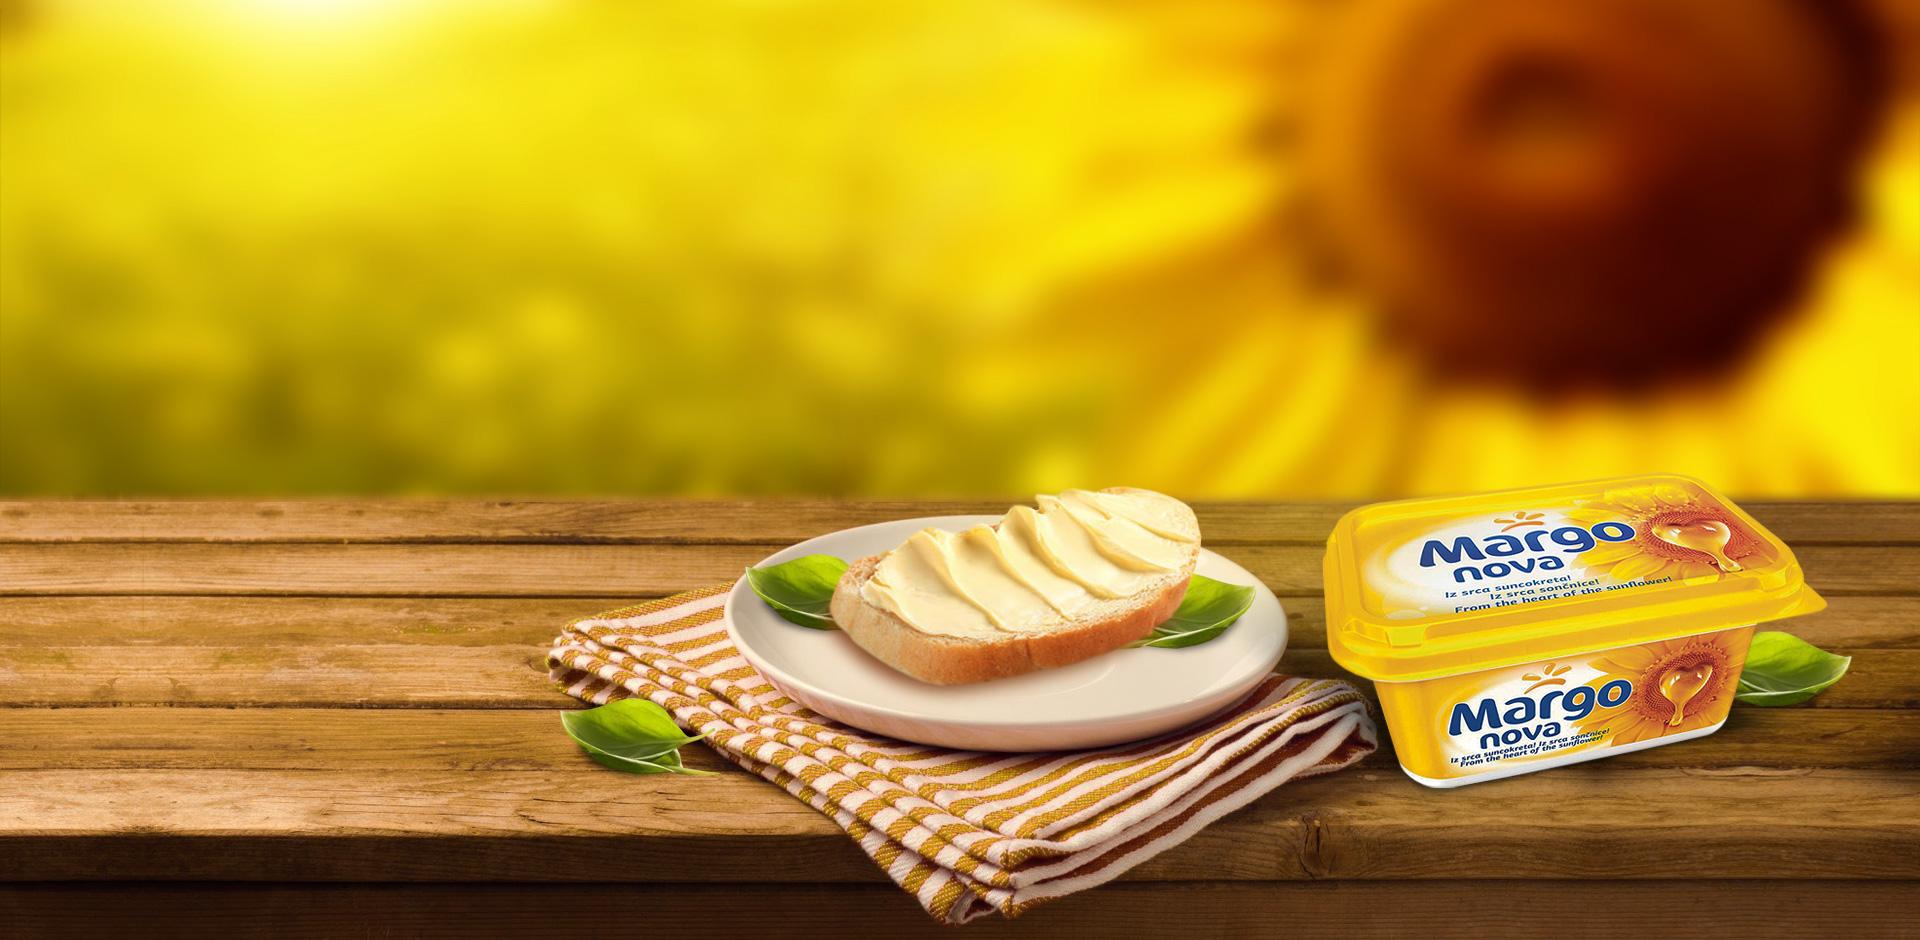 zvijezda-slider-margarin-margo-nova-02